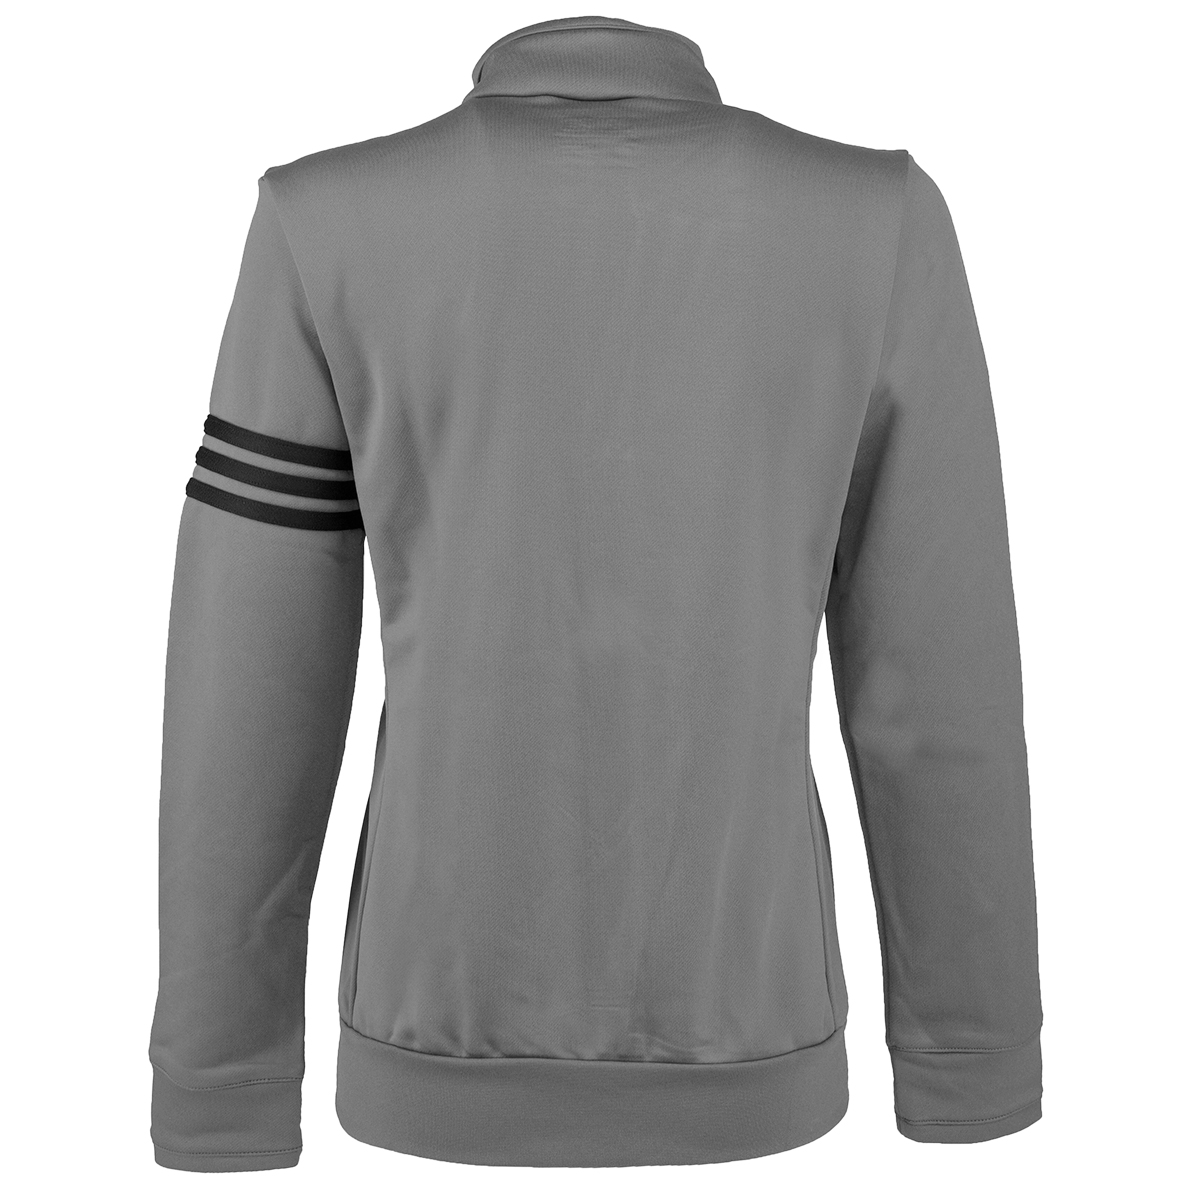 adidas-Golf-Women-039-s-Climalite-3-Stripe-Full-Zip-Jacket